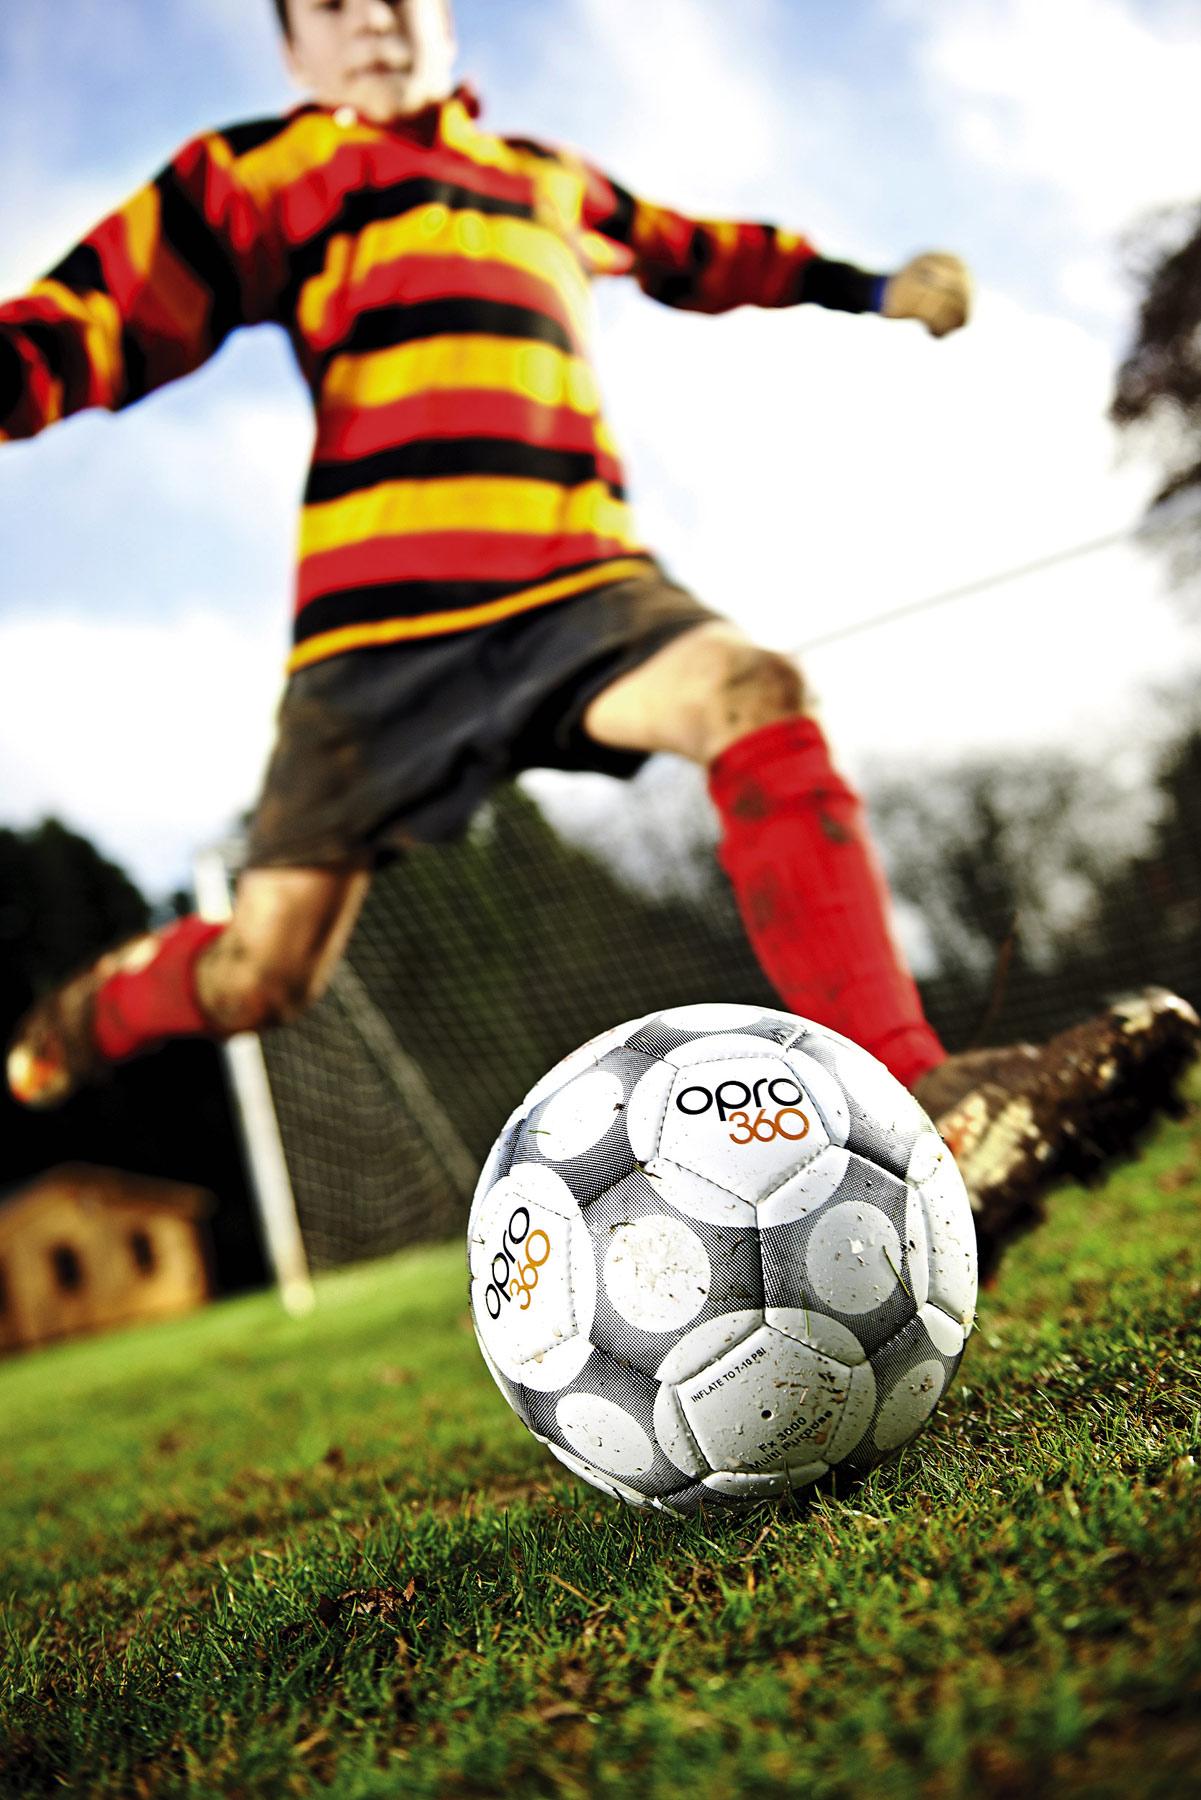 OPRO 360 football